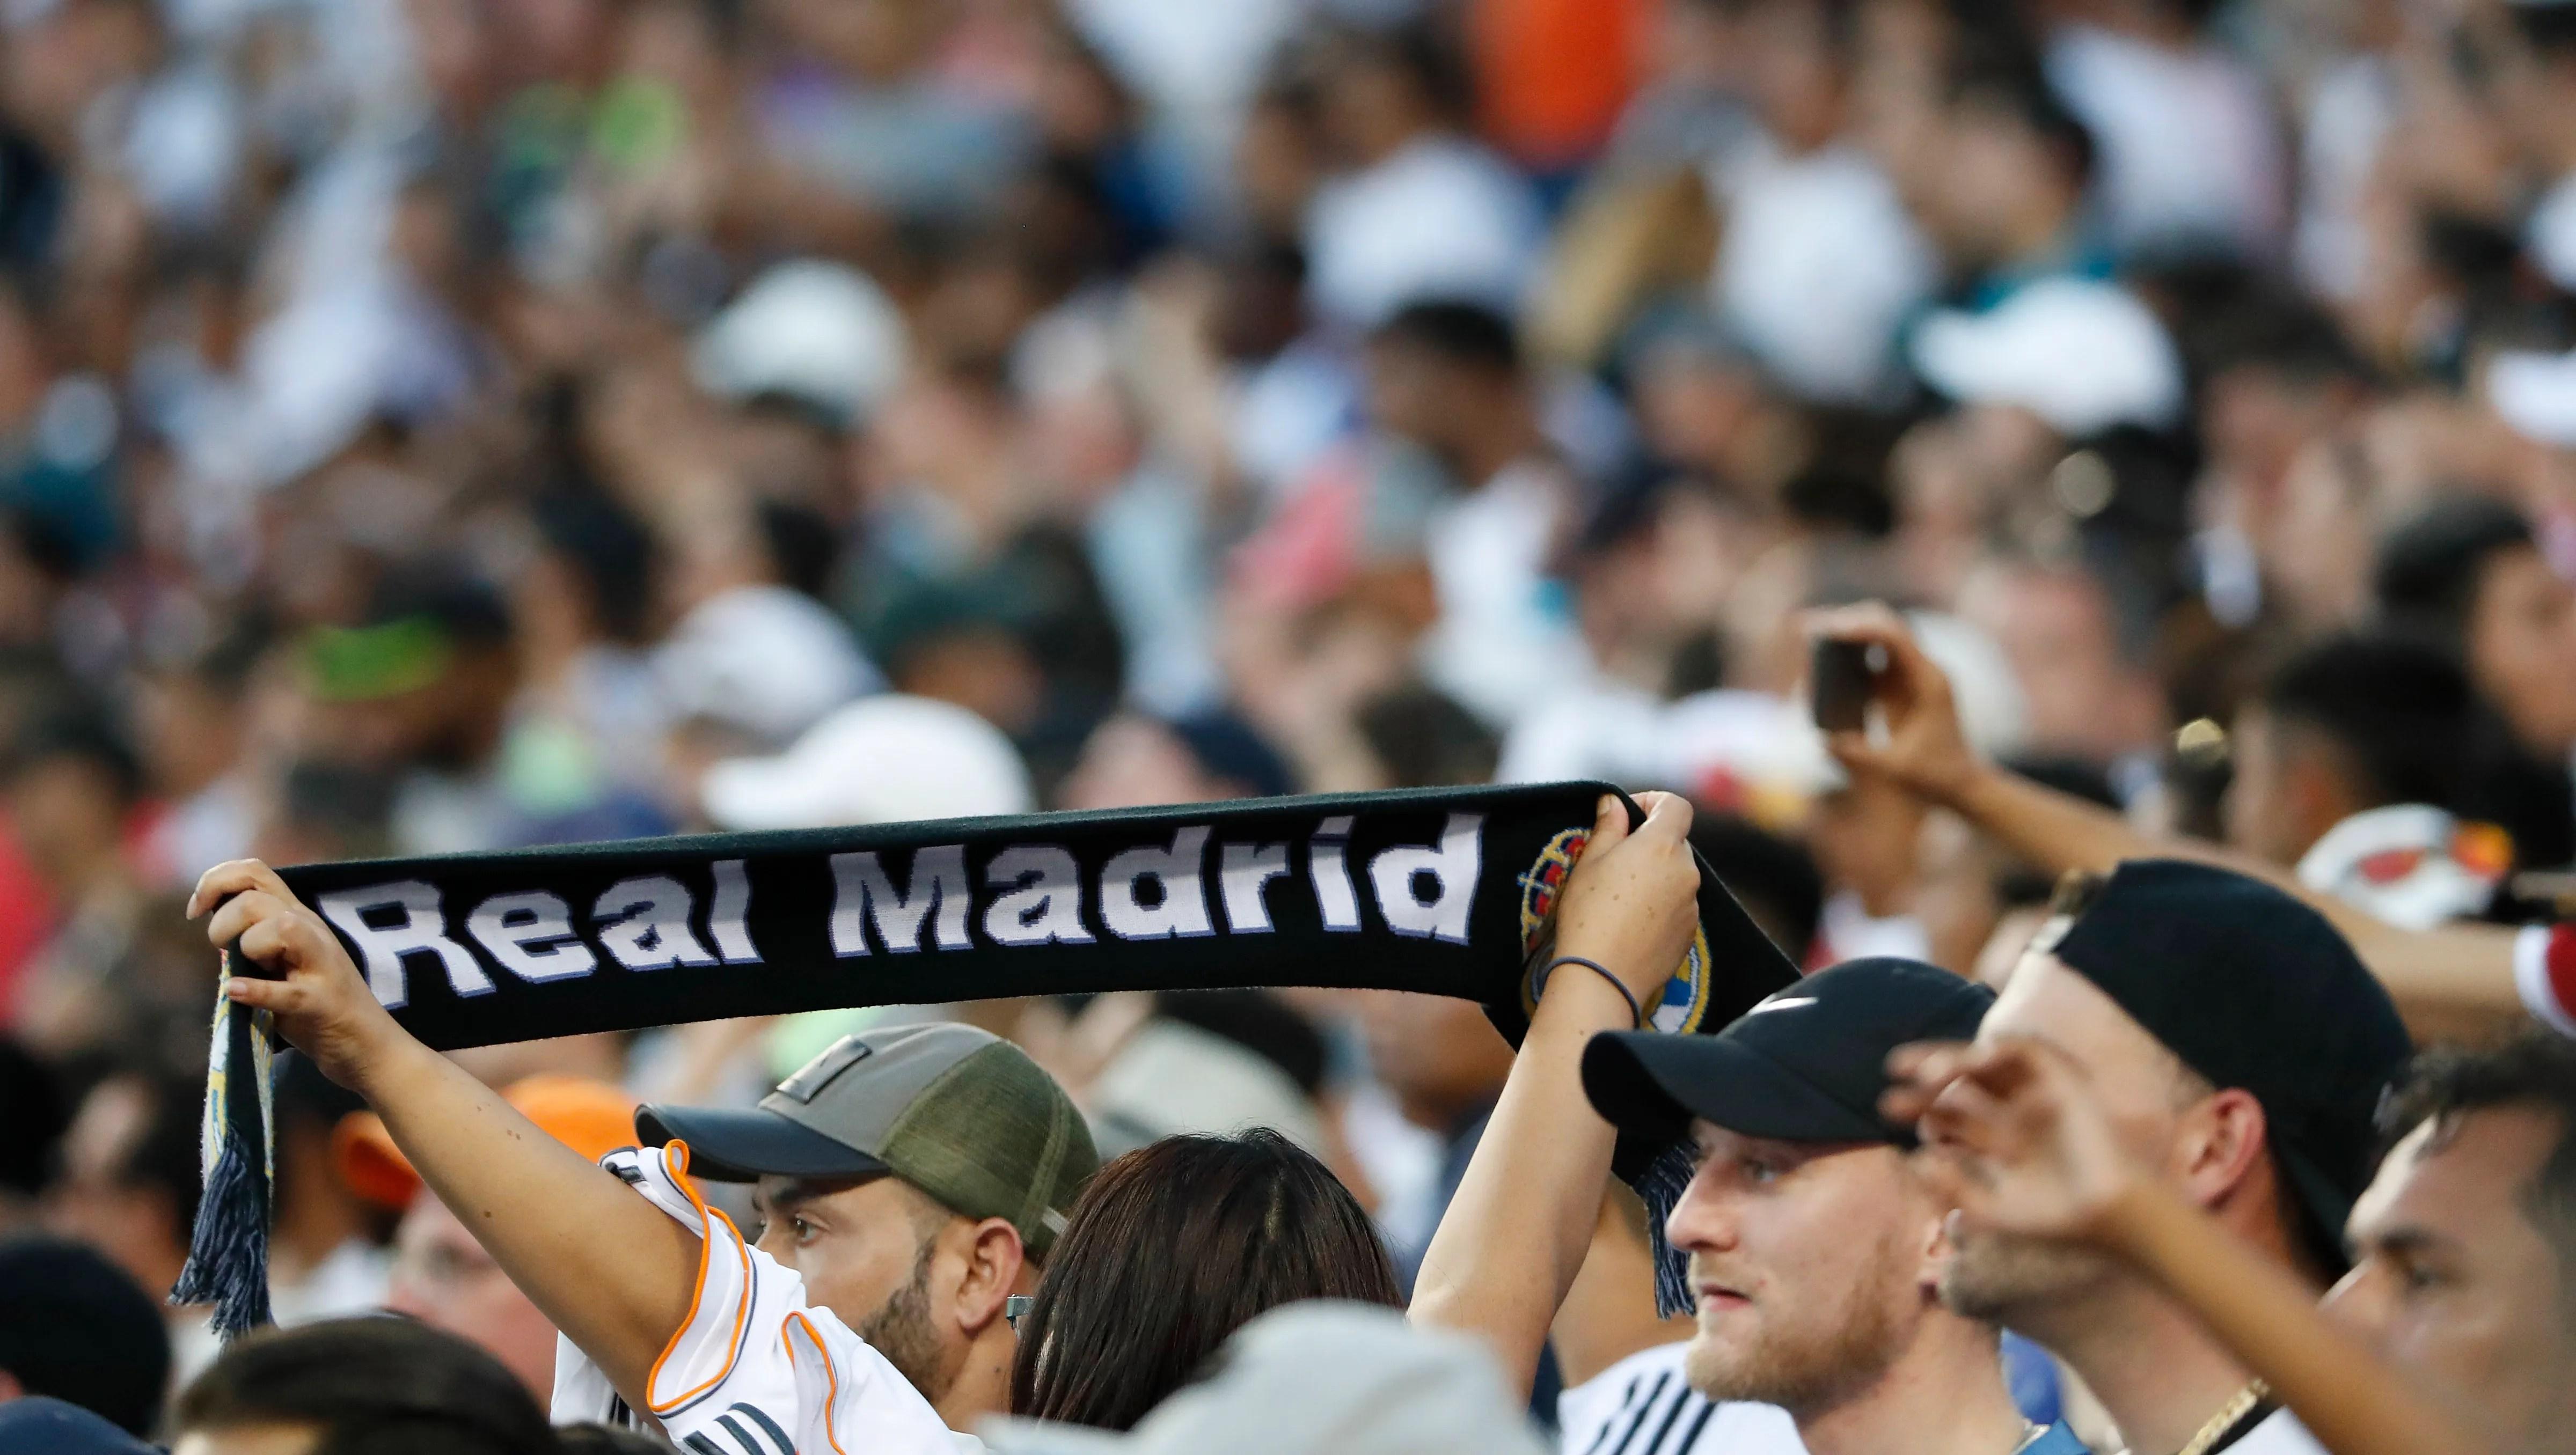 La Liga Top Spain Soccer League To Stage Regular Season